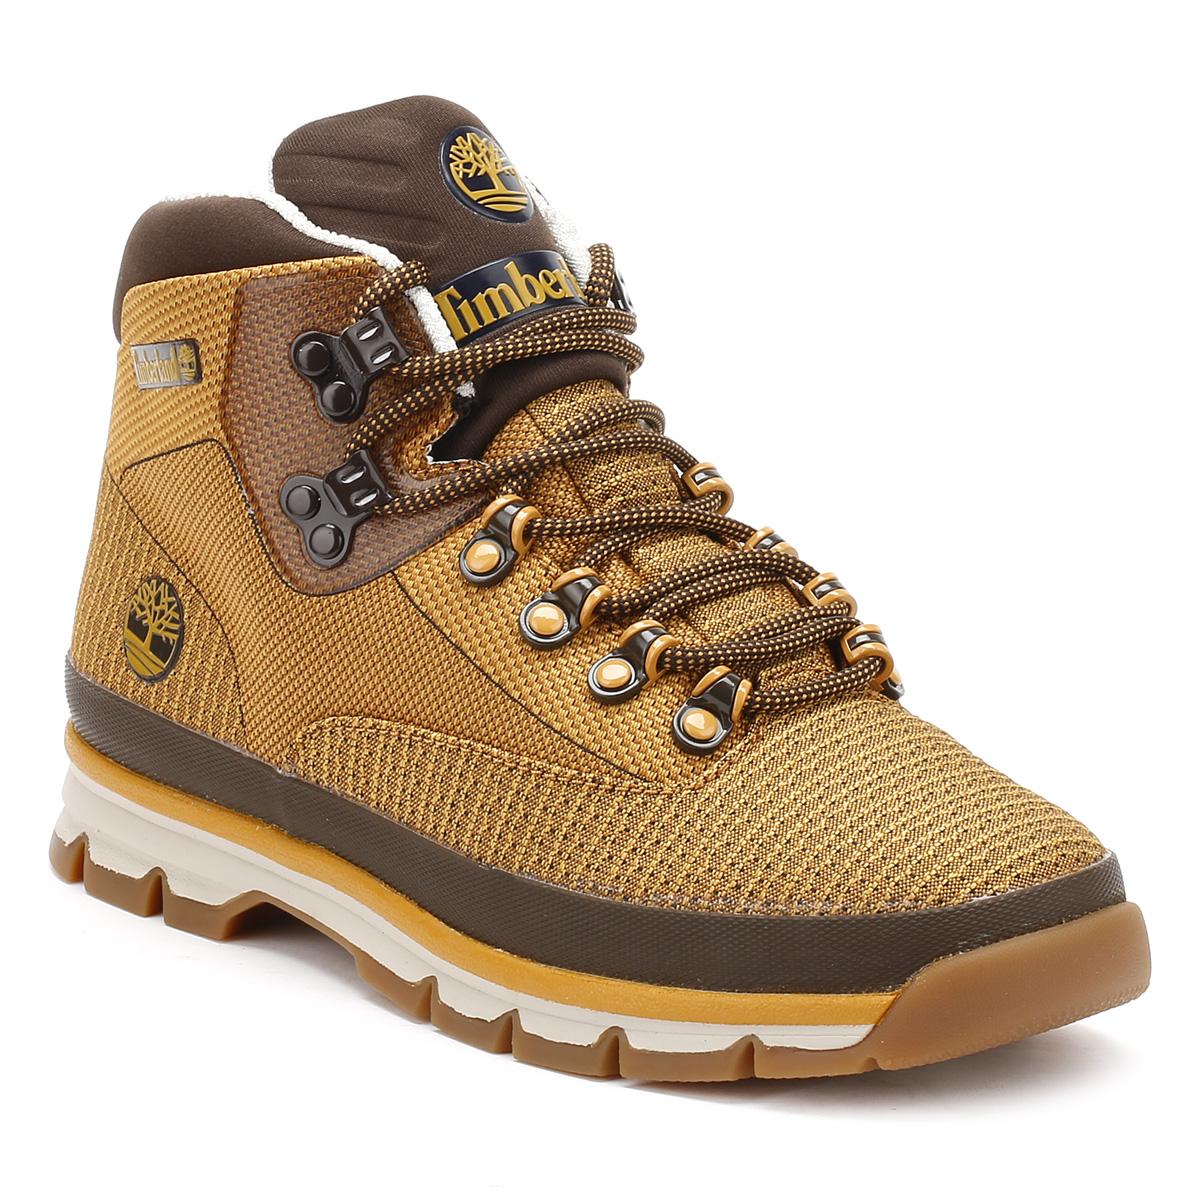 Timberland Mens Euro Hiker Boots, Wheat Jacquard, Casual ...